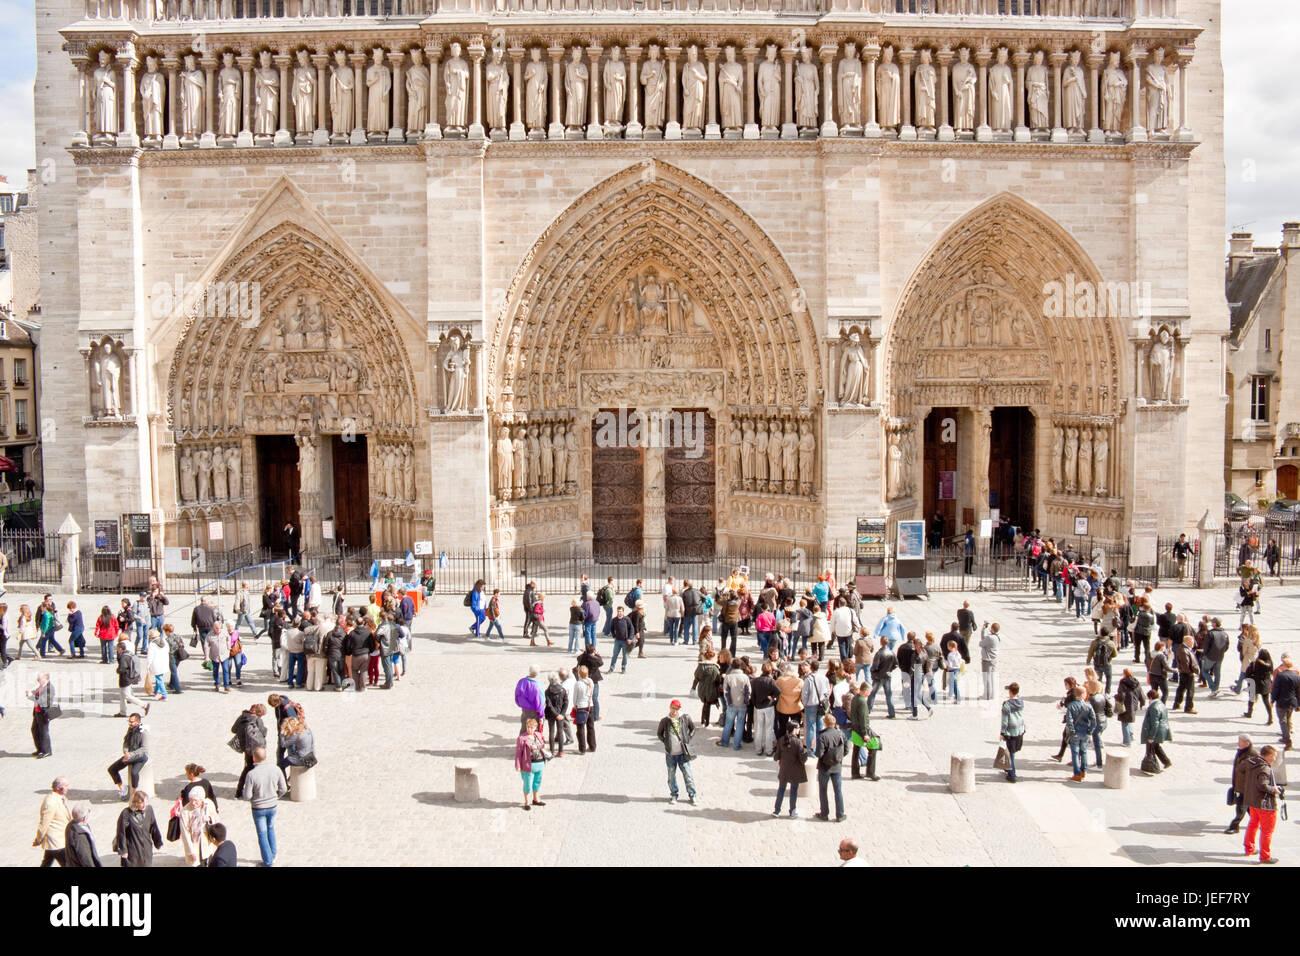 Paris, France - September 19, 2013: Tourists enjoying the  exterior of Notre Dame de Paris cathedral and waiting - Stock Image